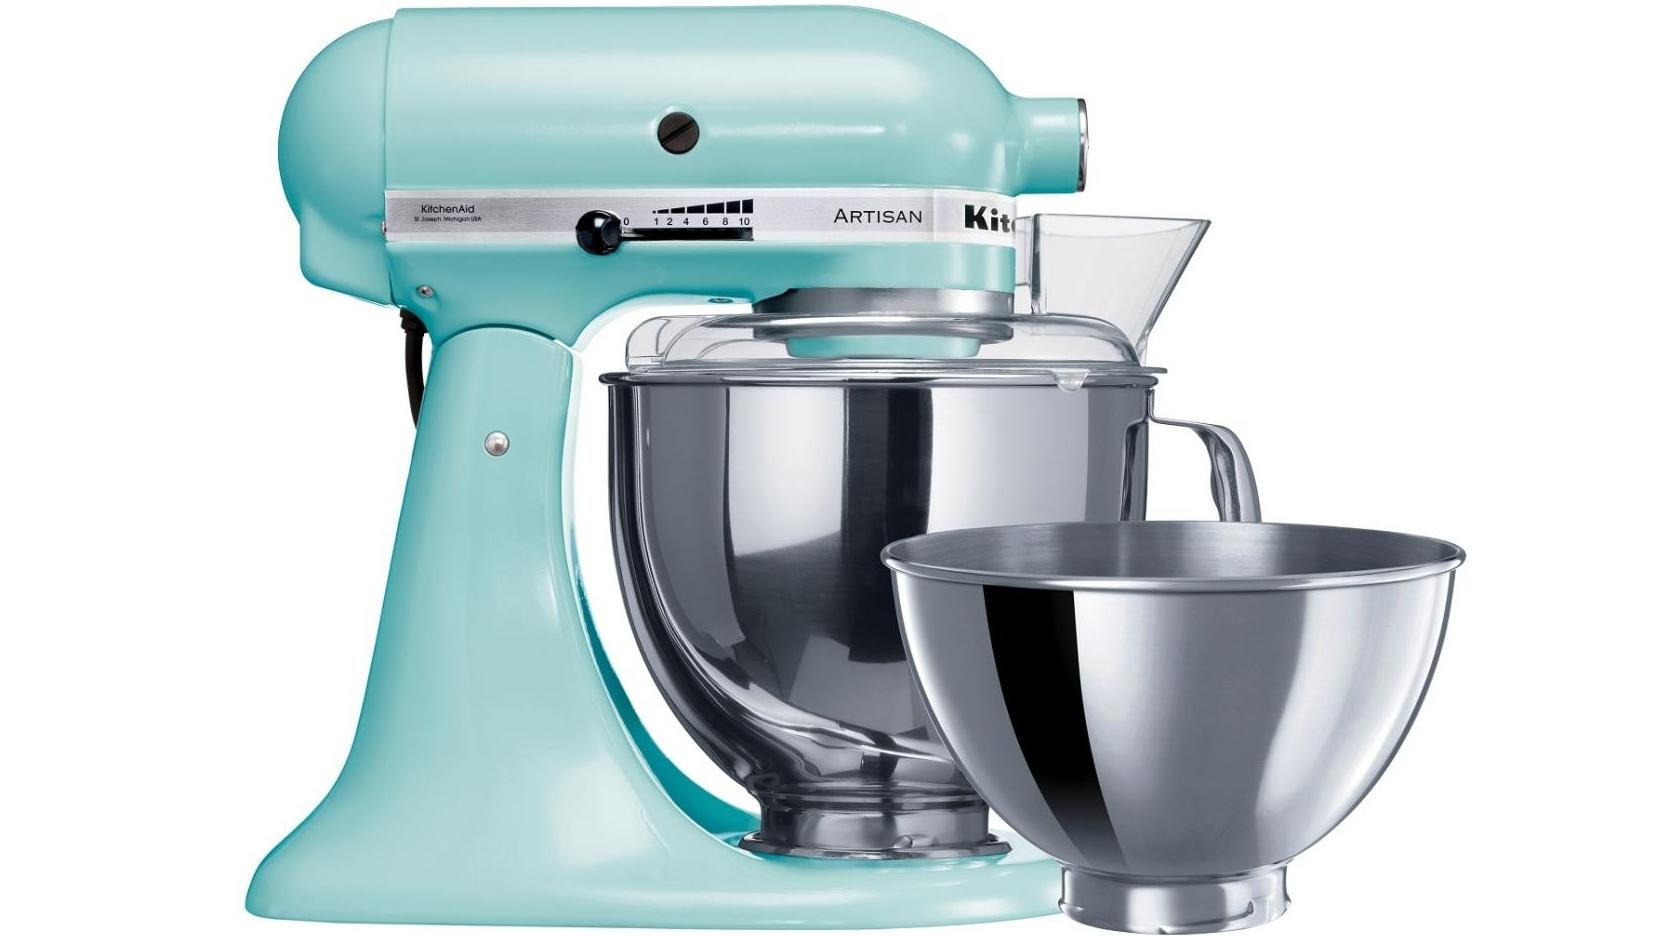 Buy KitchenAid KSM160 Artisan Stand Mixer - Ice | Harvey Norman AU